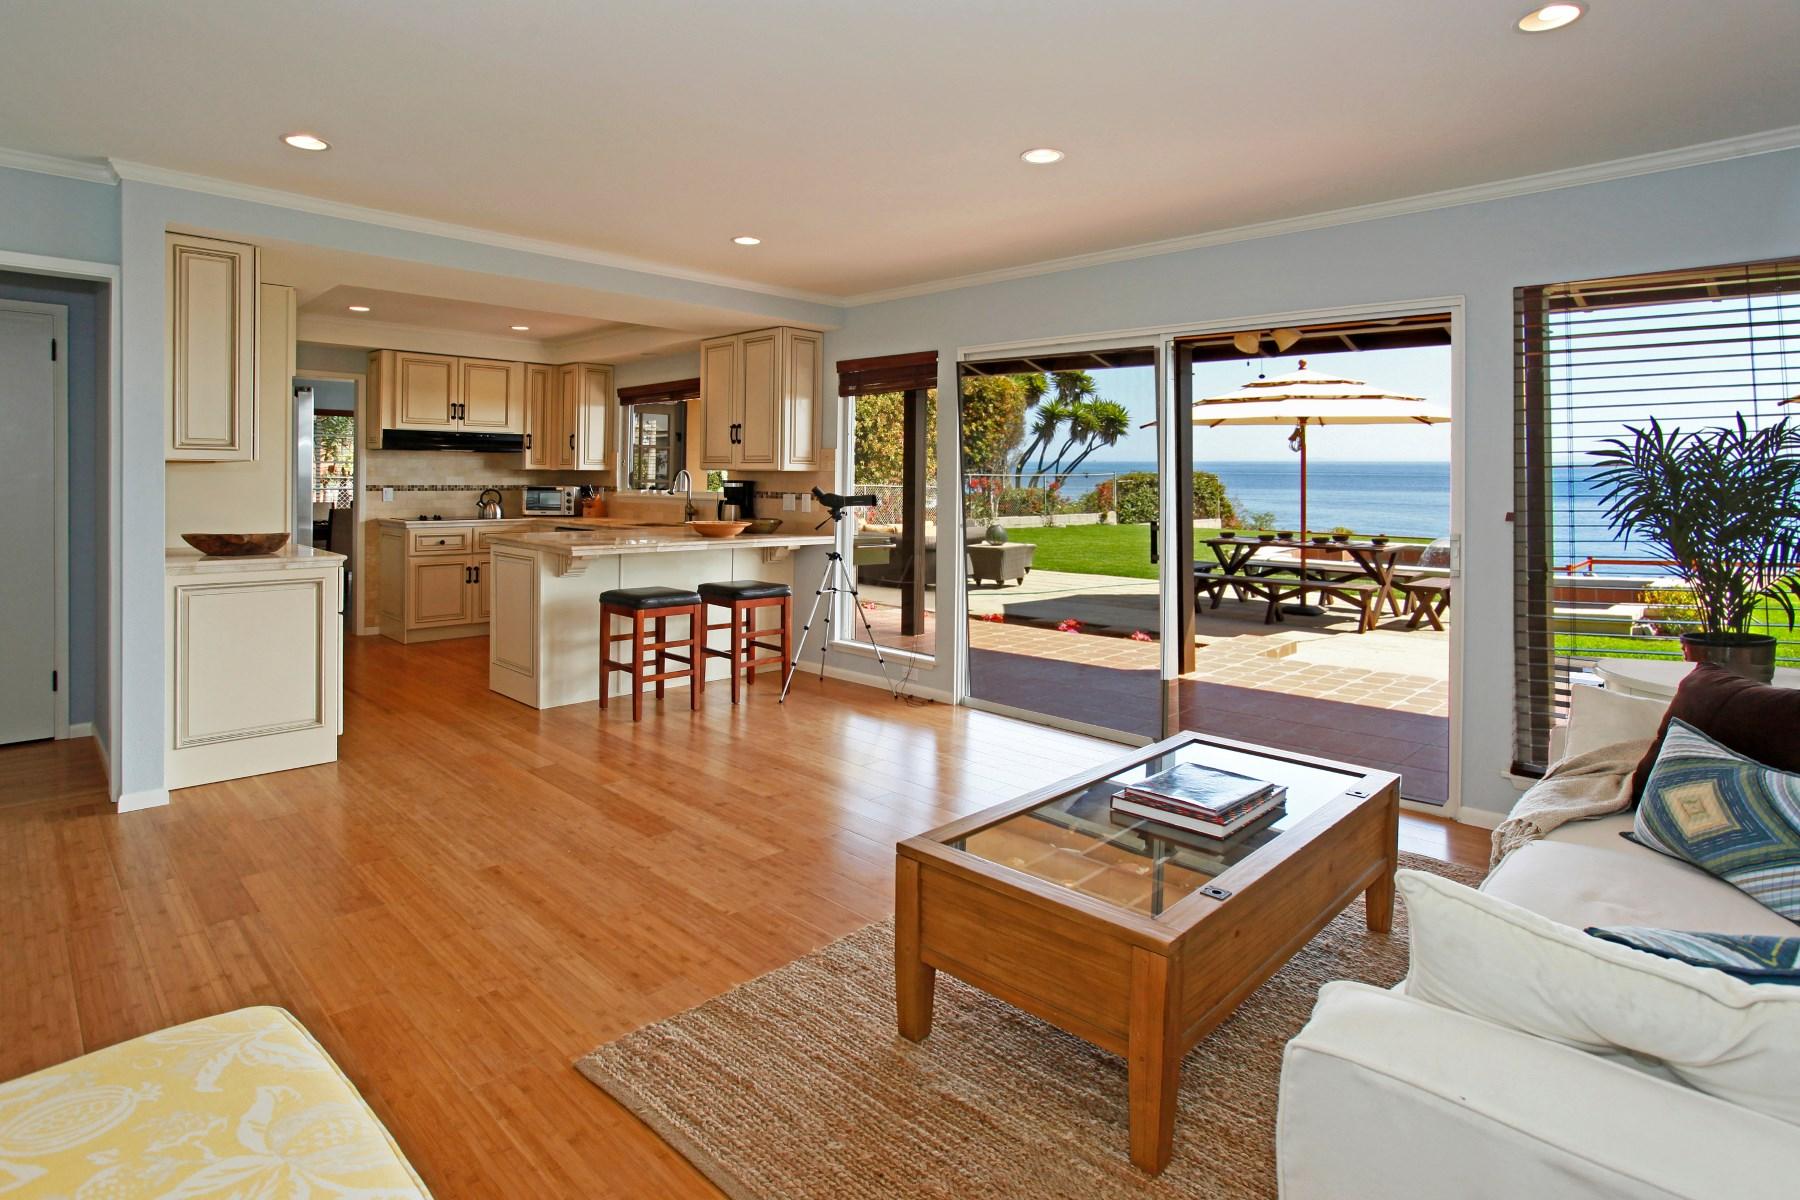 Property For Sale at Spectacular Ocean Front Rental